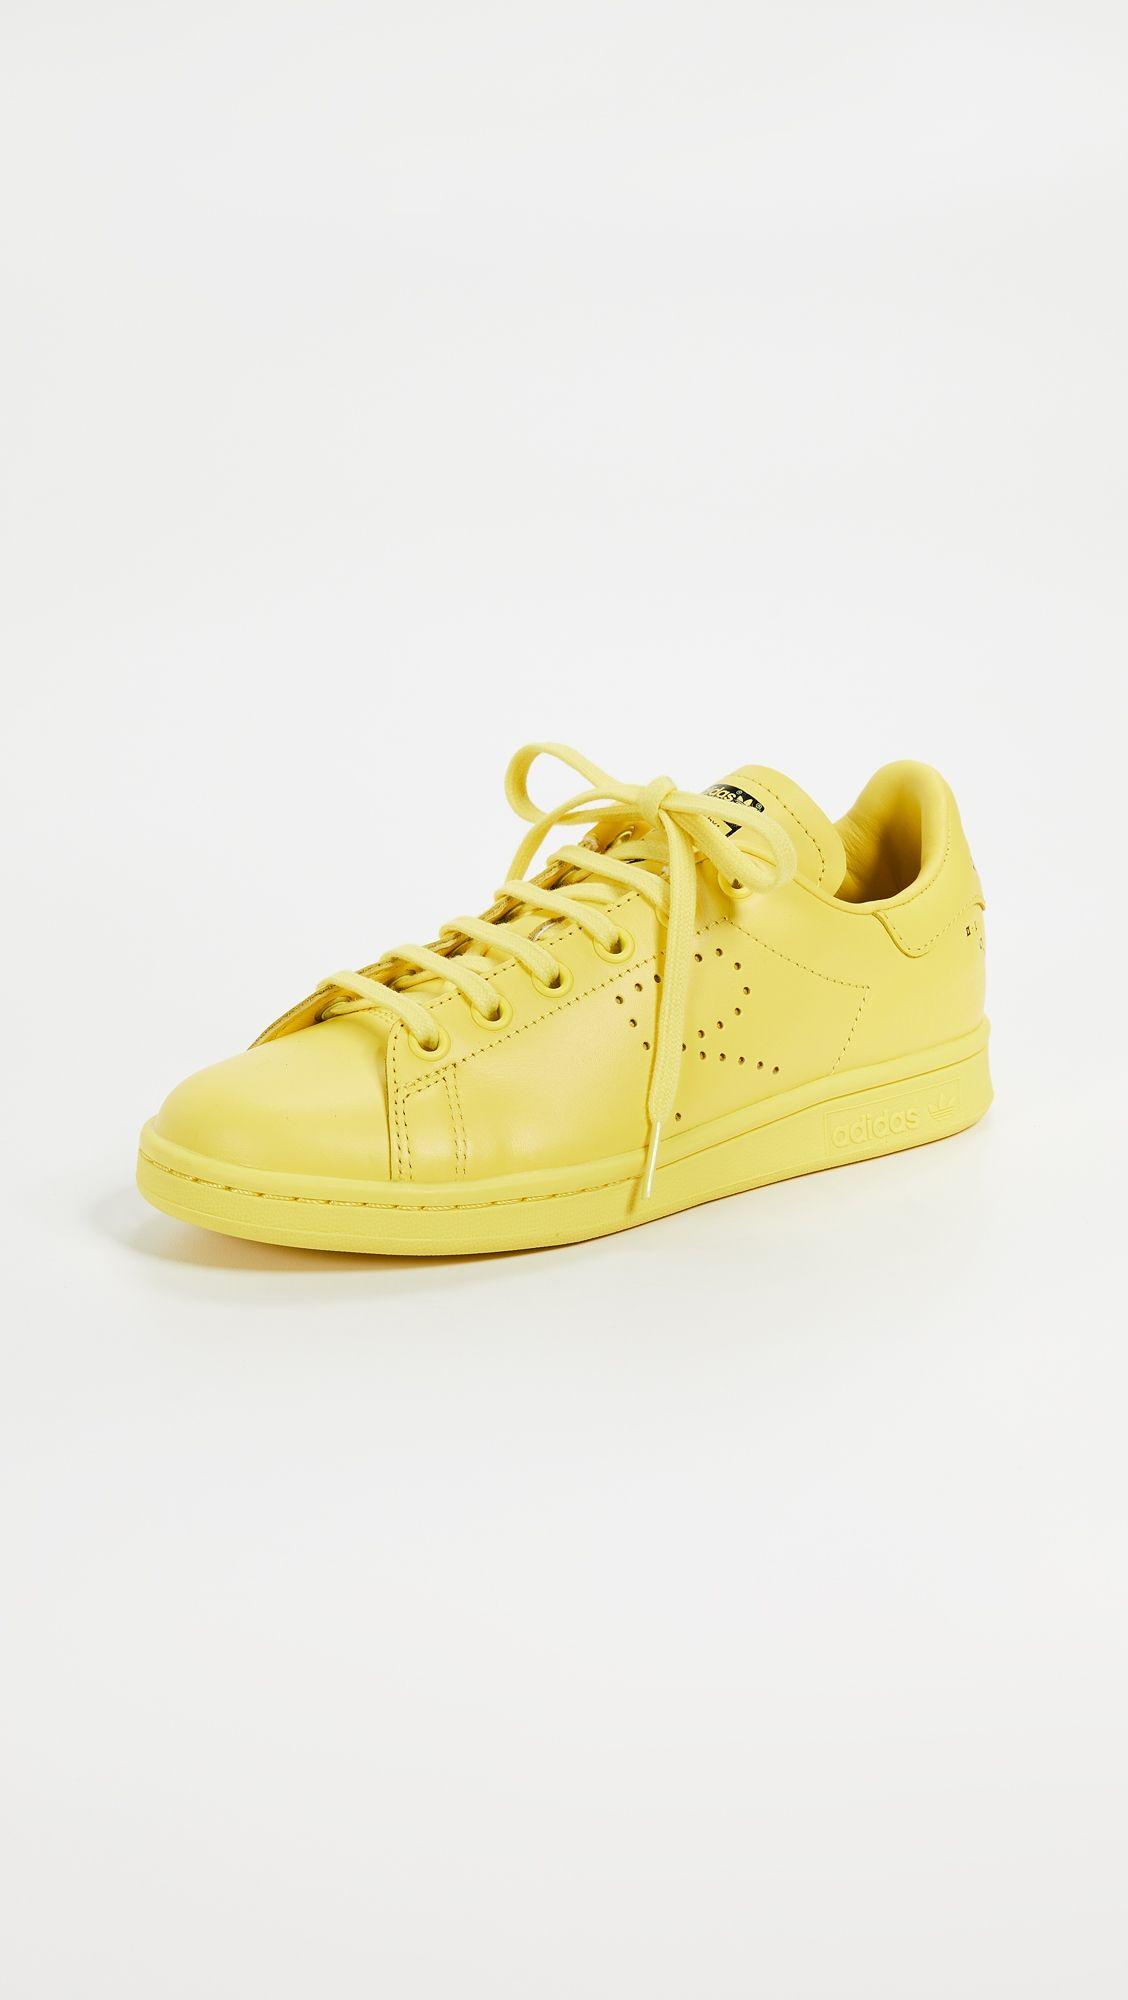 54606a8e400 Adidas Raf Simmons Stan Smith Sneakers Raf Simons Stan Smith